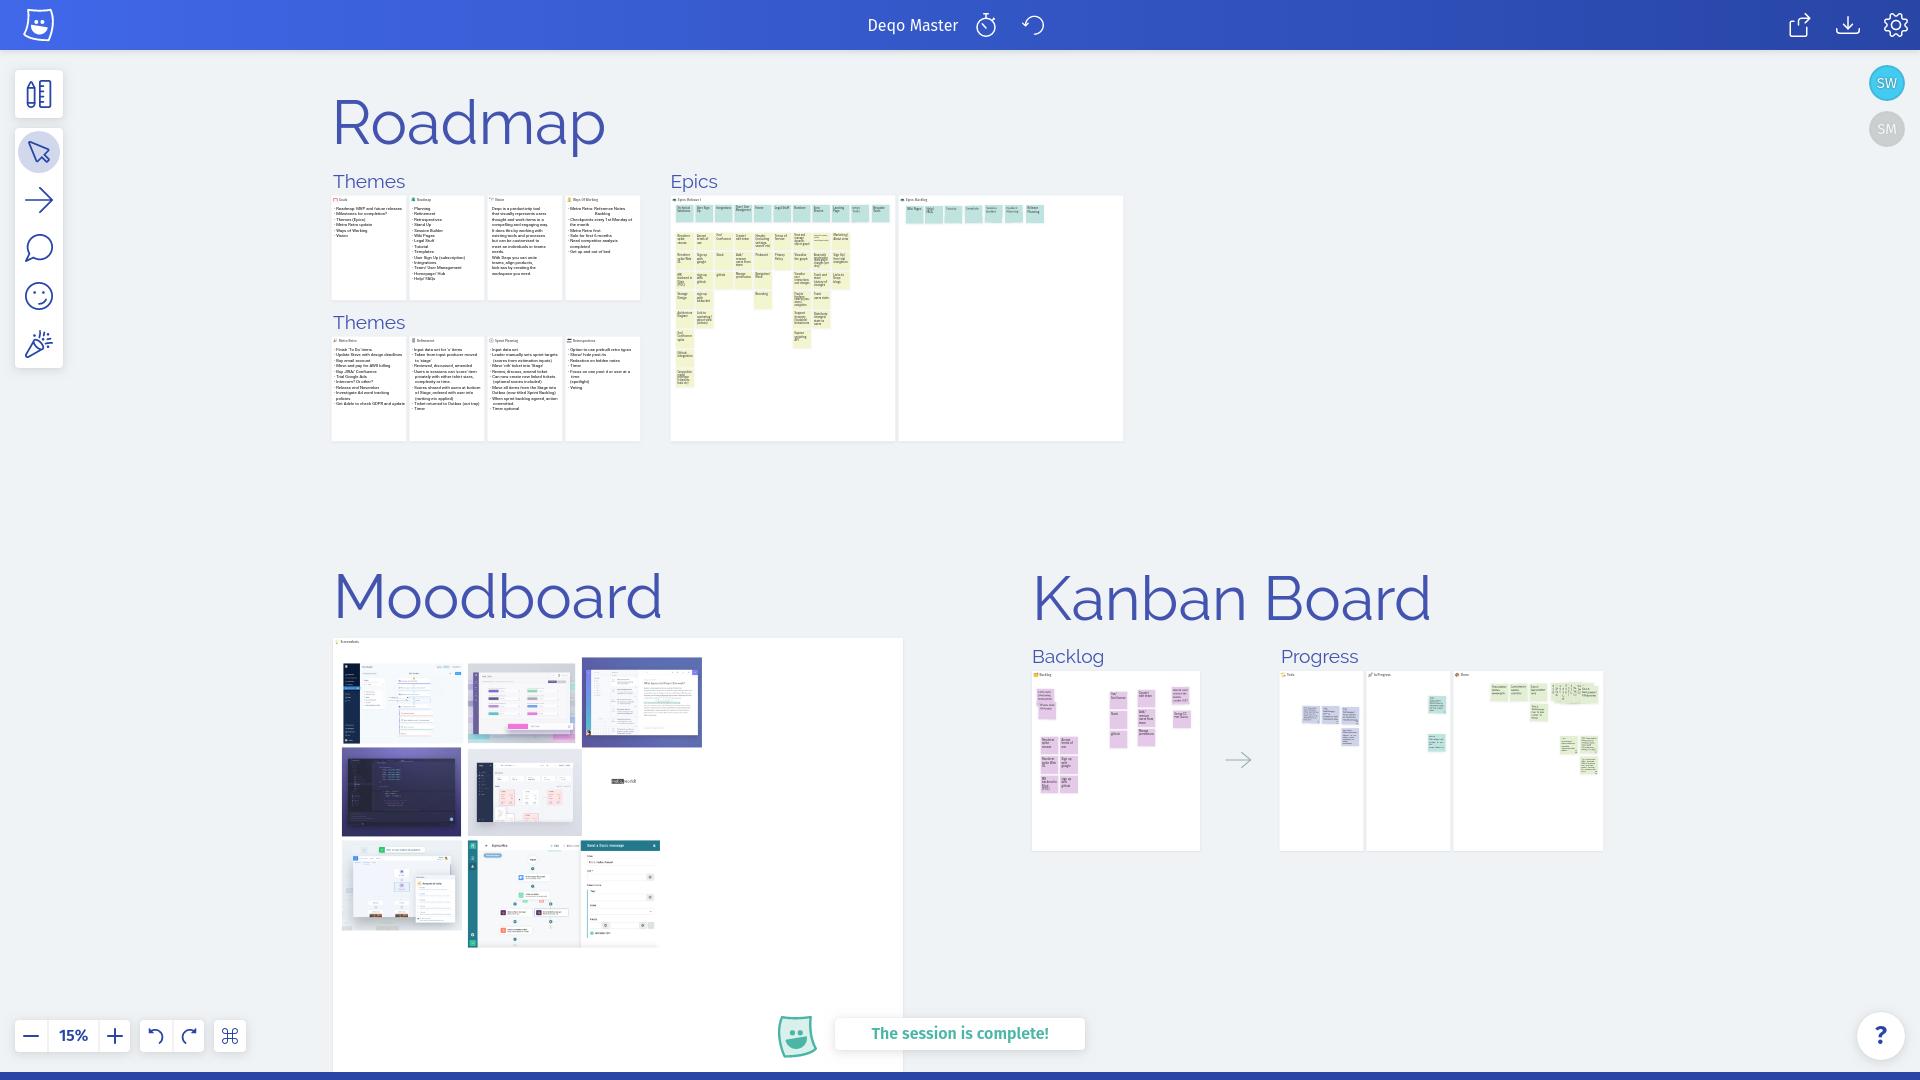 New product development board.